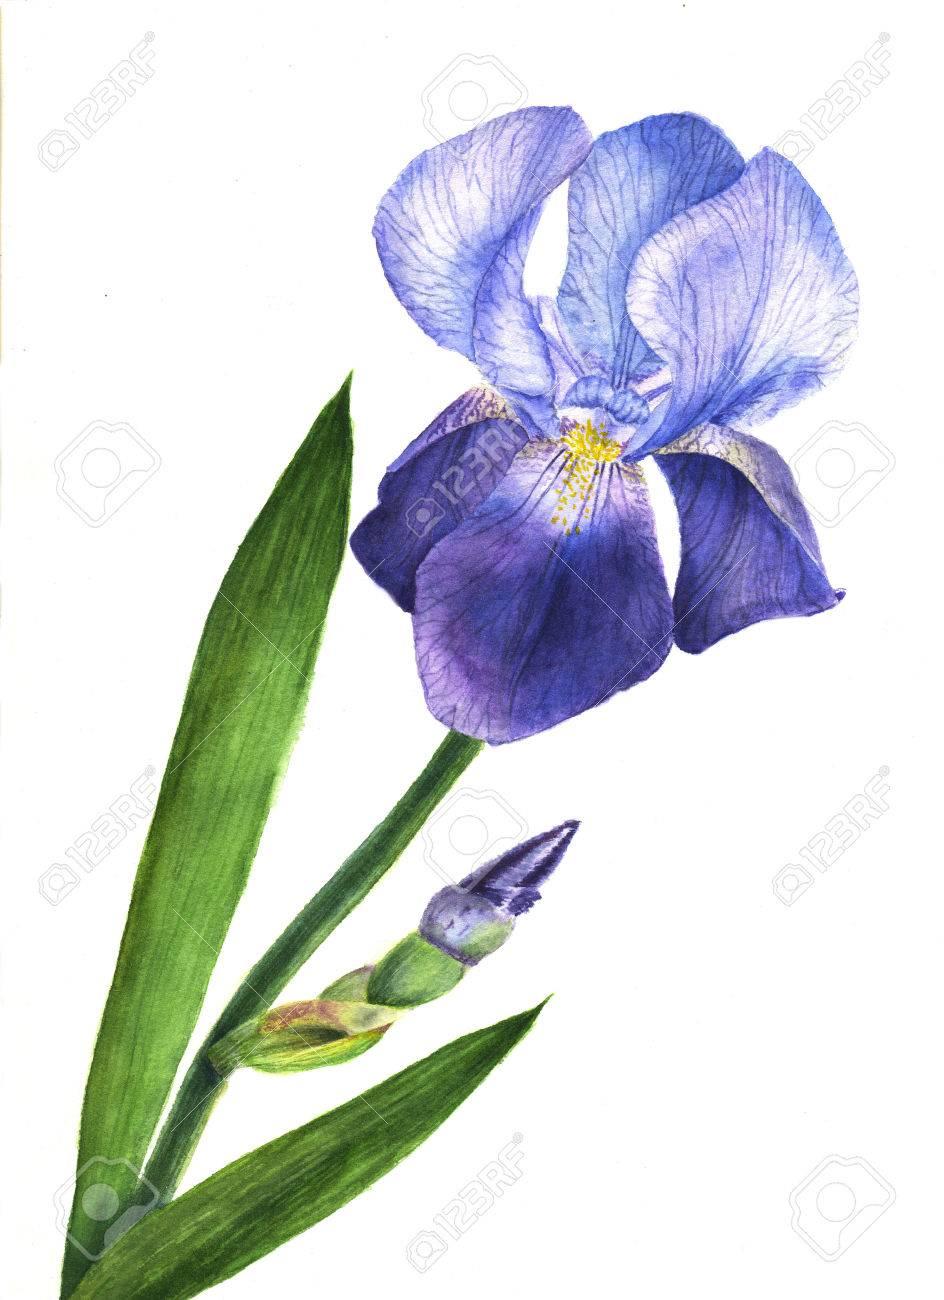 Watercolor illustration purple iris flower plant wildflower stock illustration watercolor illustration purple iris flower plant wildflower iris flower in a watercolor style isolated izmirmasajfo